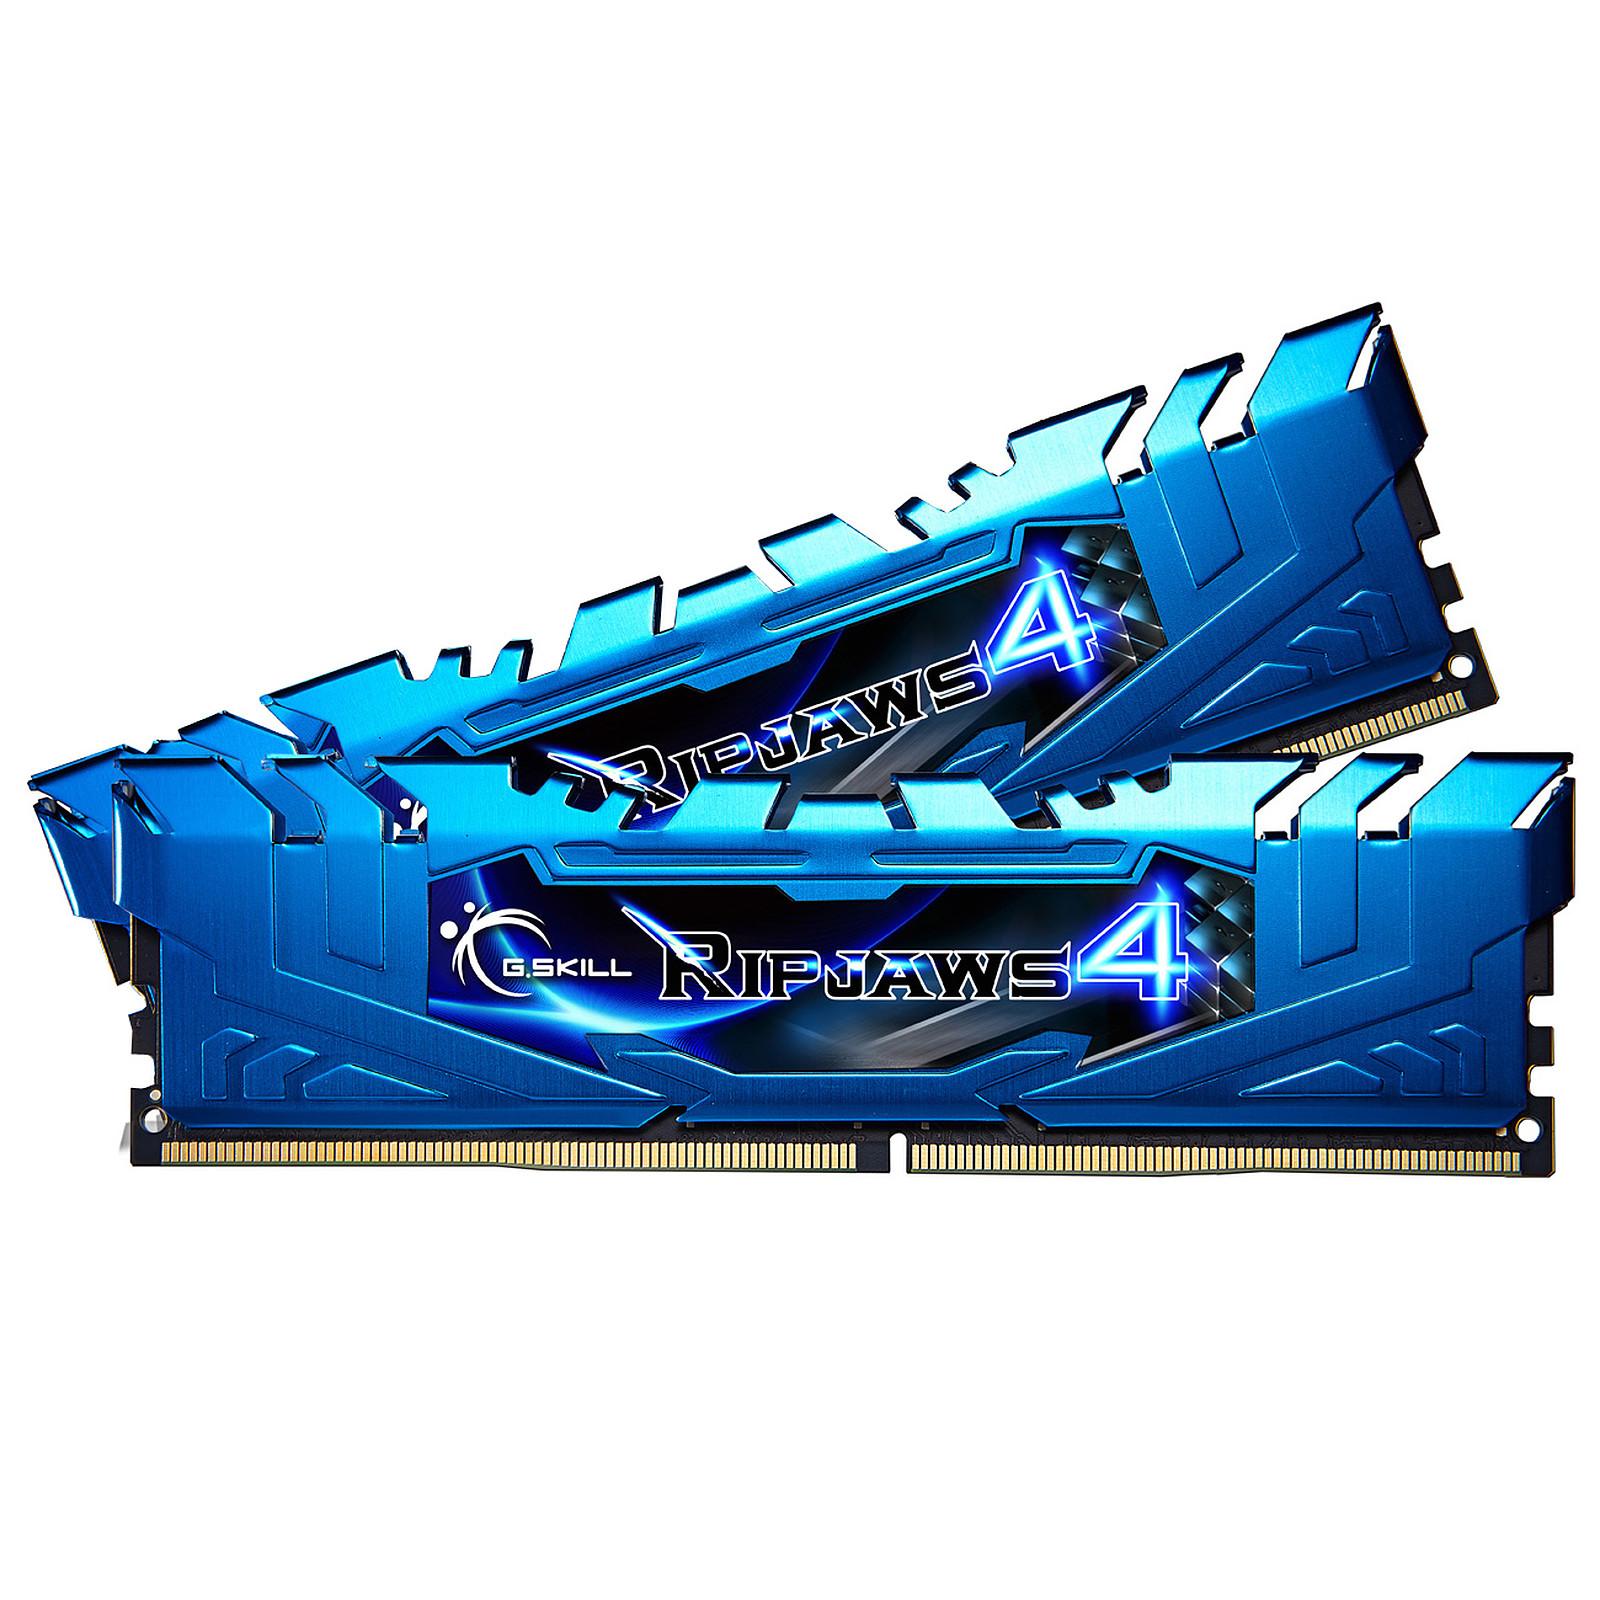 G.Skill RipJaws 4 Series Bleu 8 Go (2x 4 Go) DDR4 3000 MHz CL15